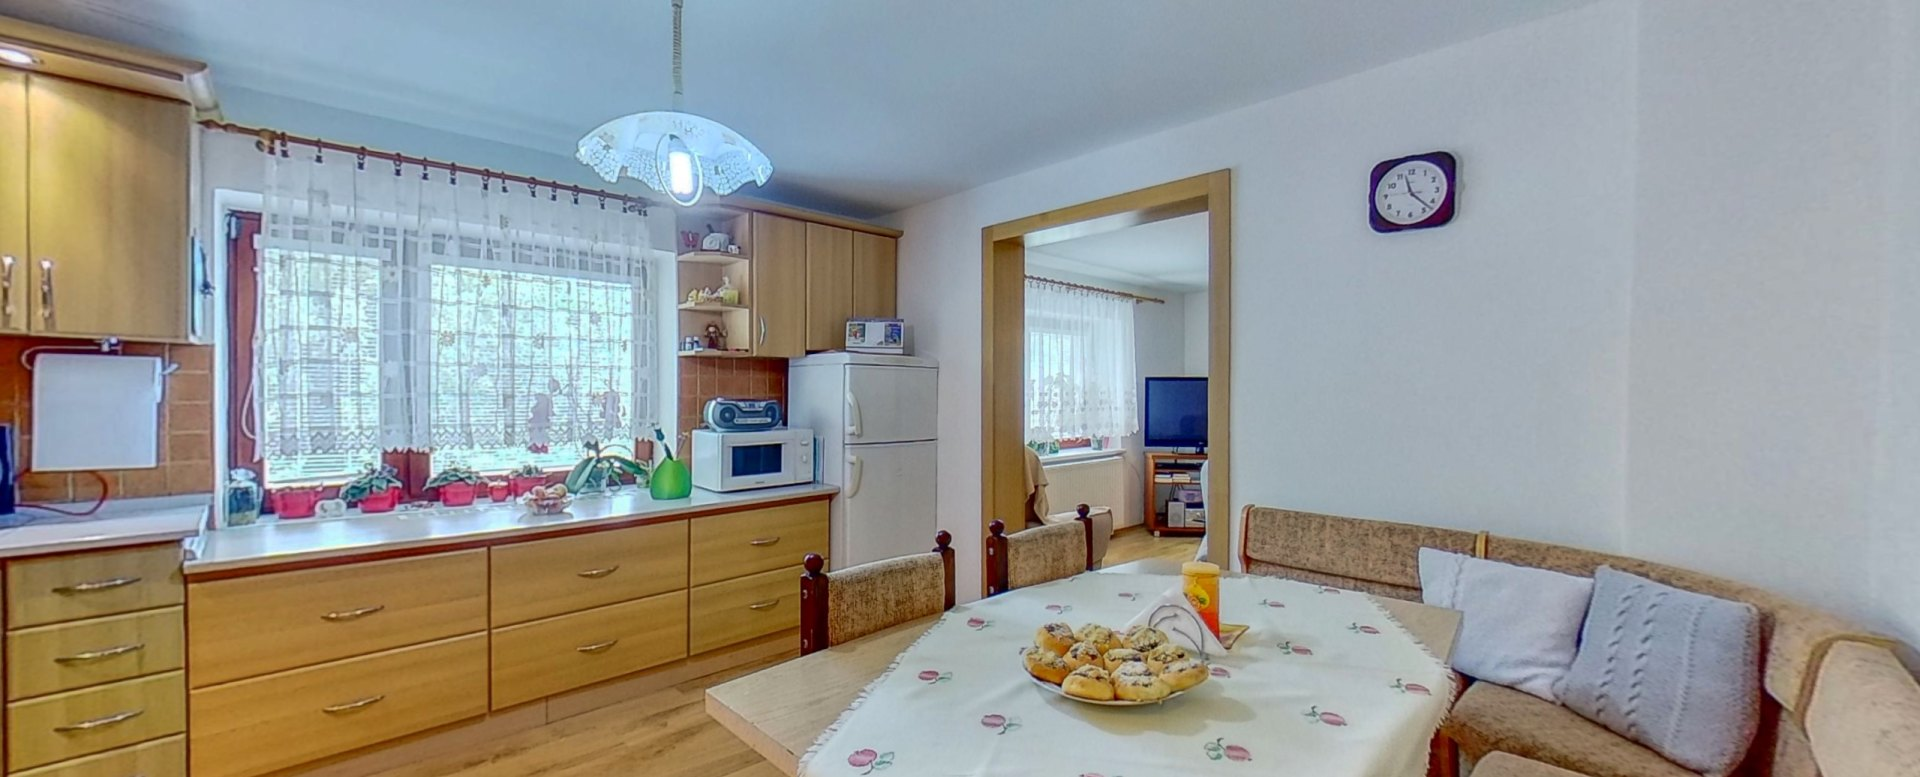 Jedálnesky stôl a lavica v kuchyni